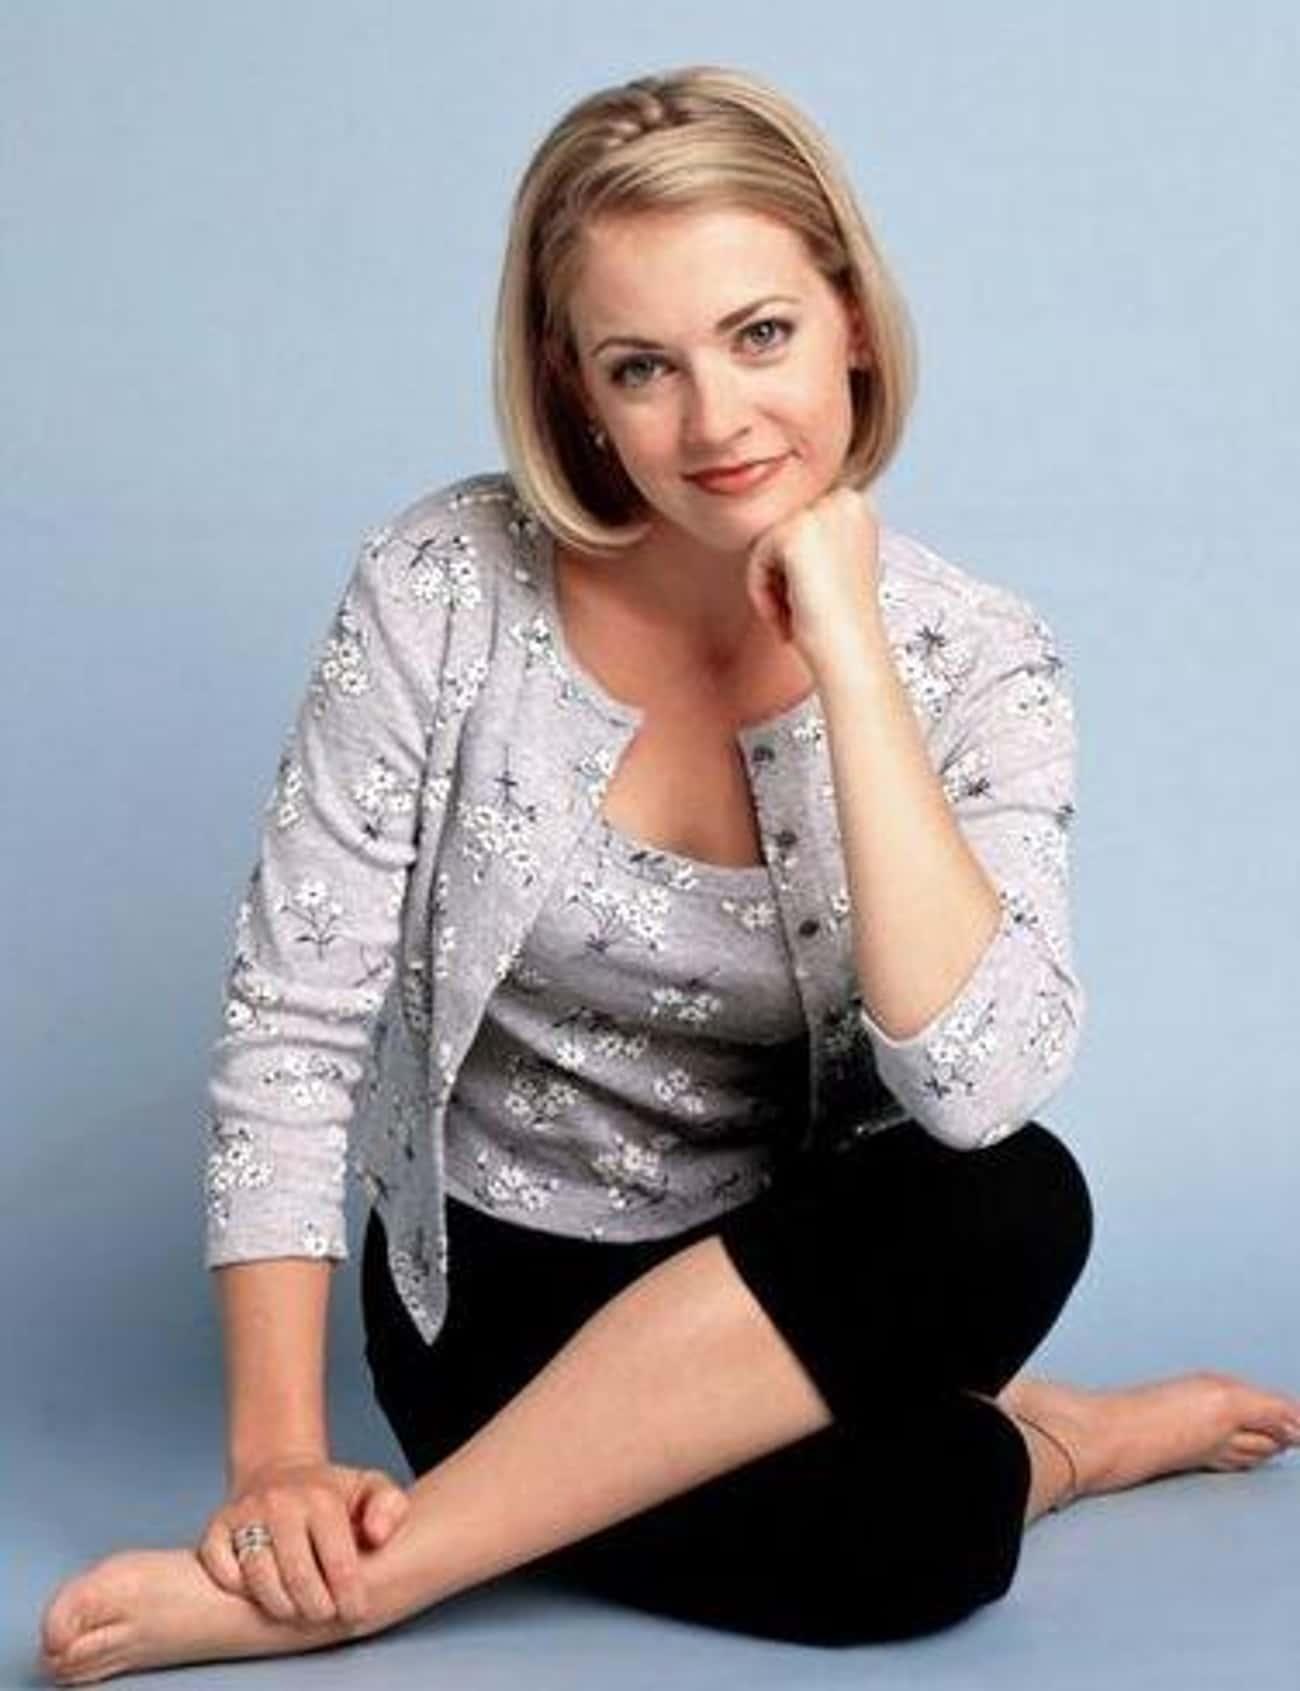 Sabrina From 'Sabrina, The Teenage Witch'